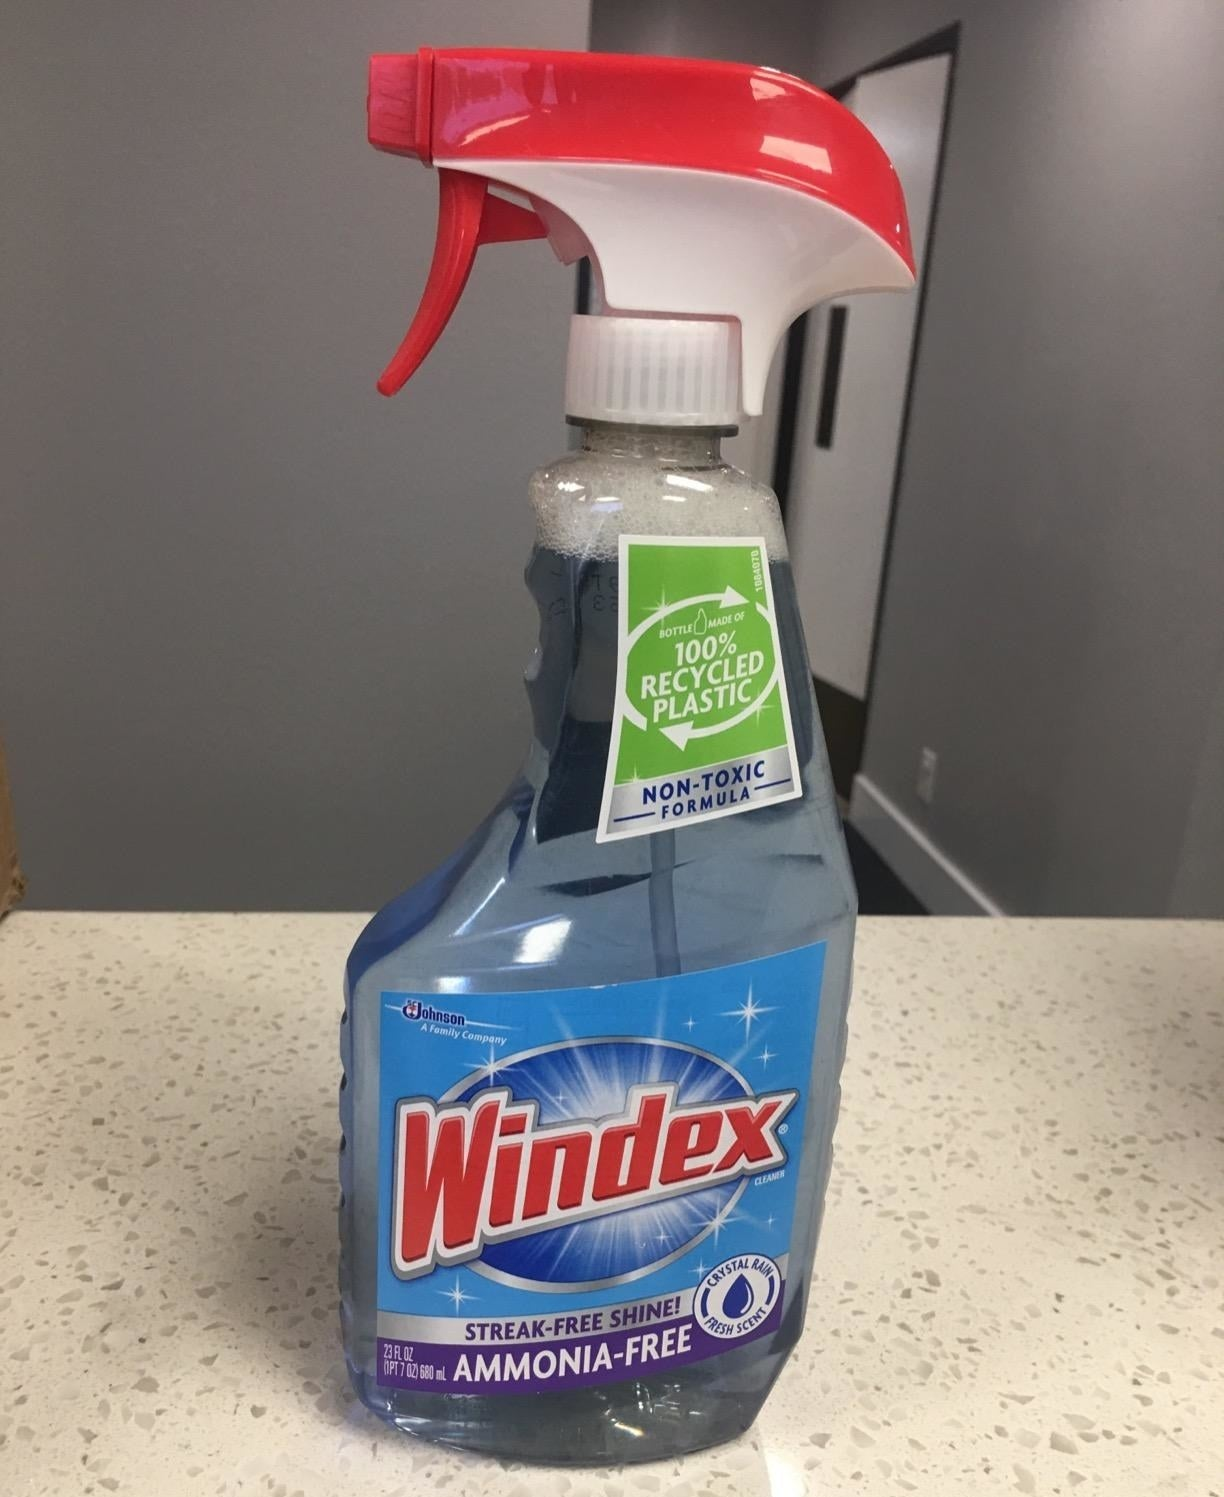 The spray bottle